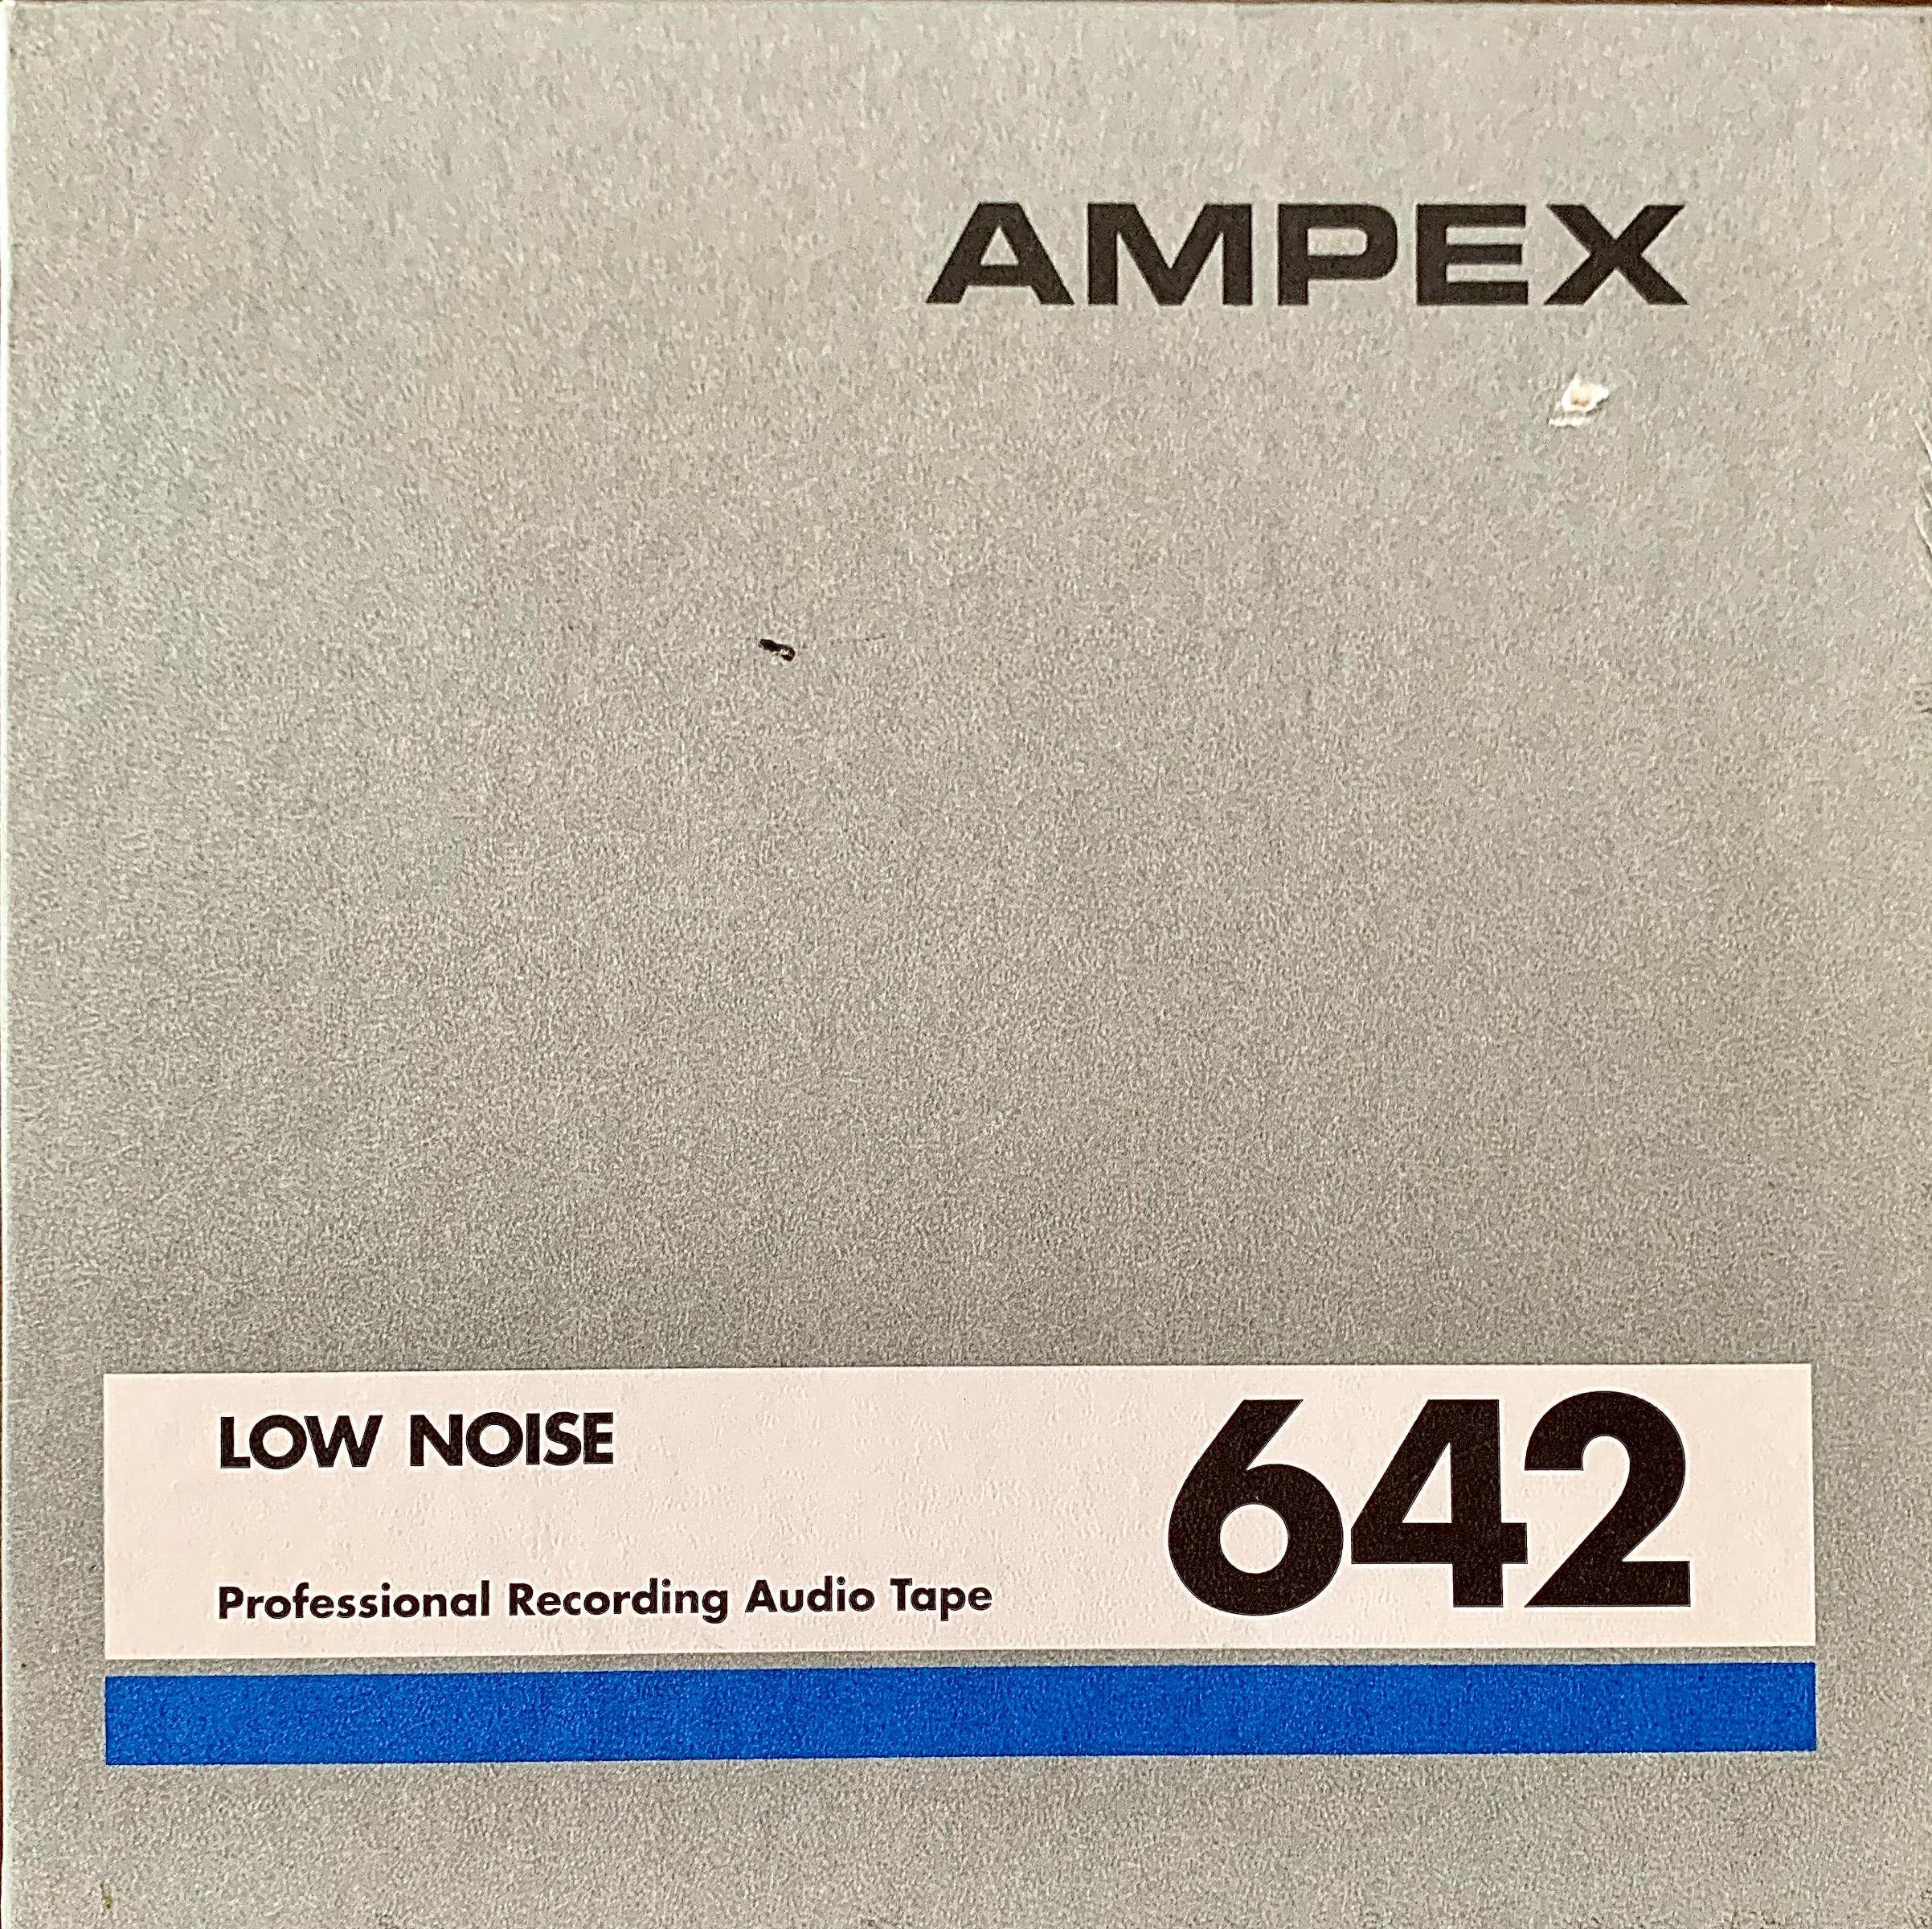 Ampex-642-Tape-Box